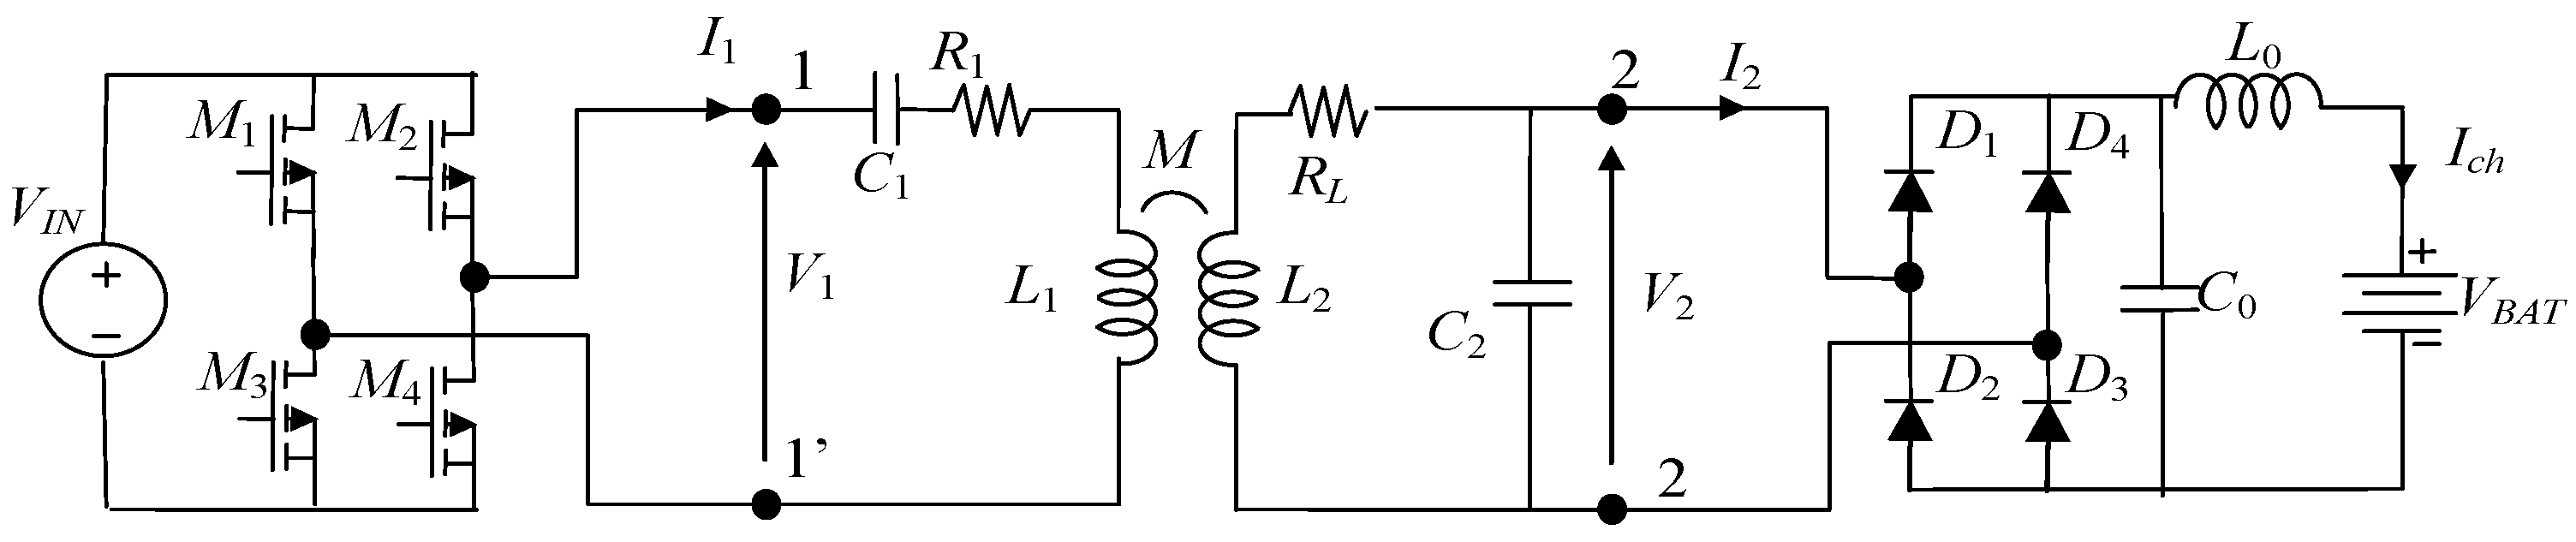 Energies | Free Full-Text | Wireless Power Transfer